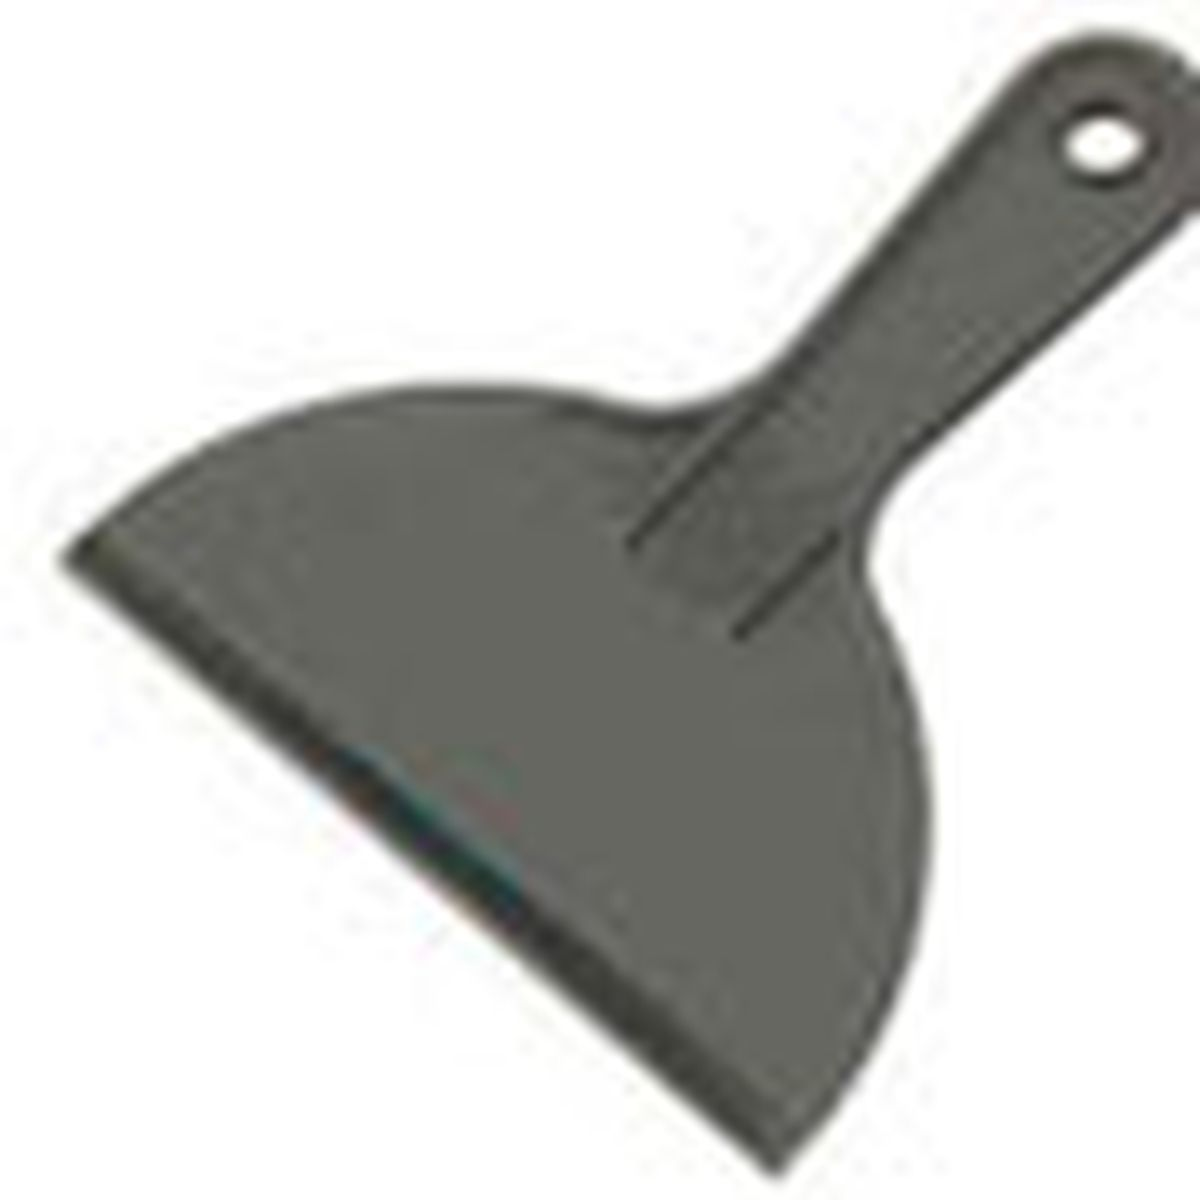 plastic putty knife